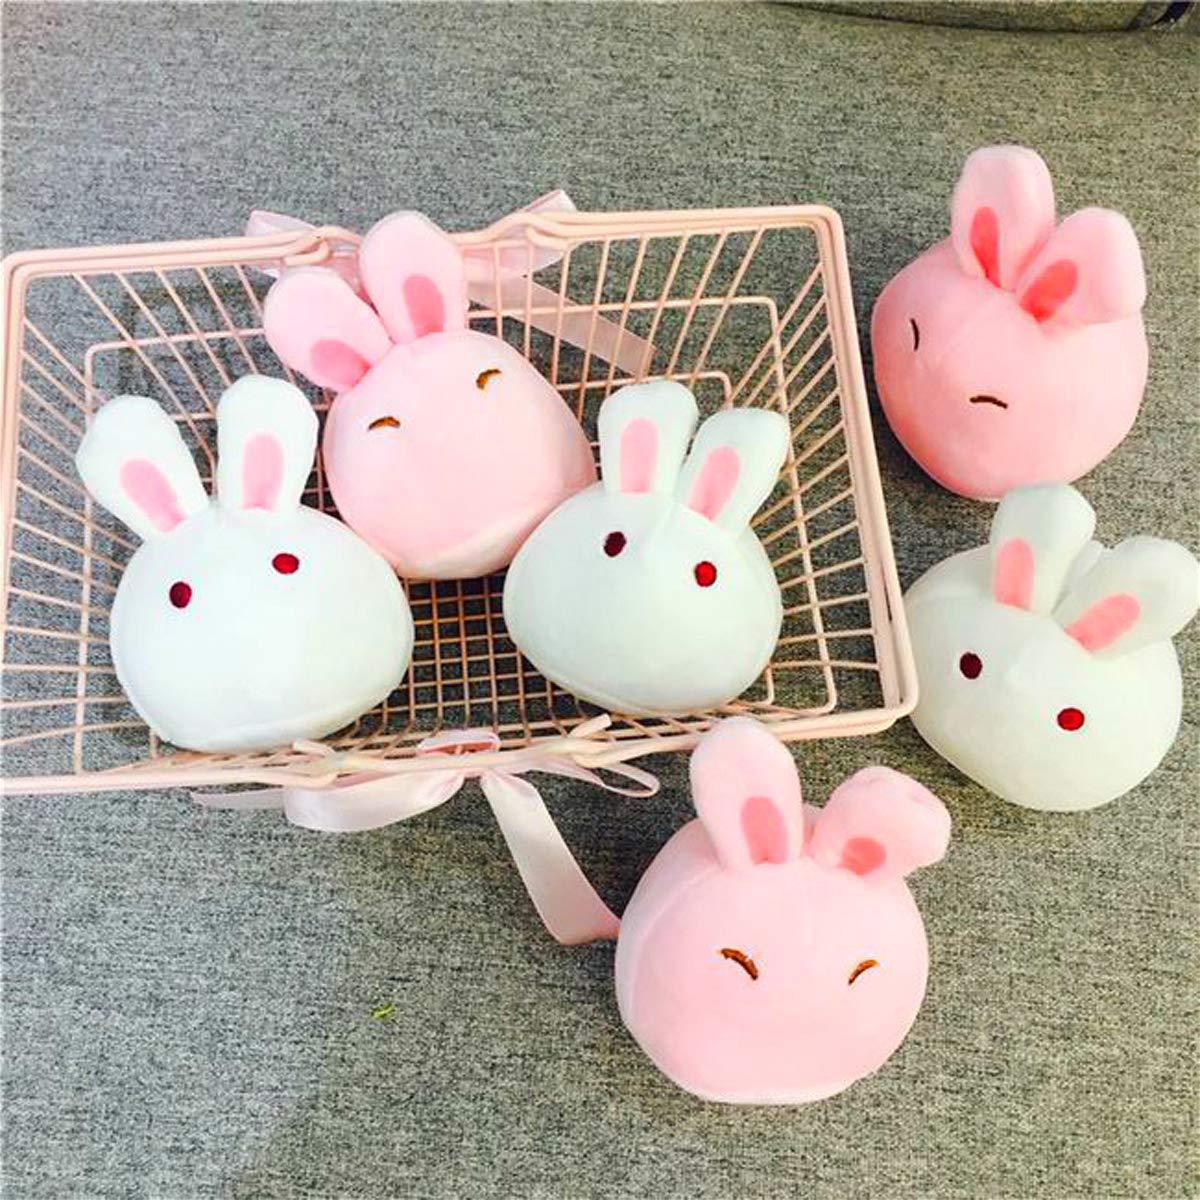 Nenalayo Cute Throw Pillow Stuffed Animal Toys Removable Fluffy Bunnies Creative Gifts for Teens Girls Kids by Nenalayo (Image #7)